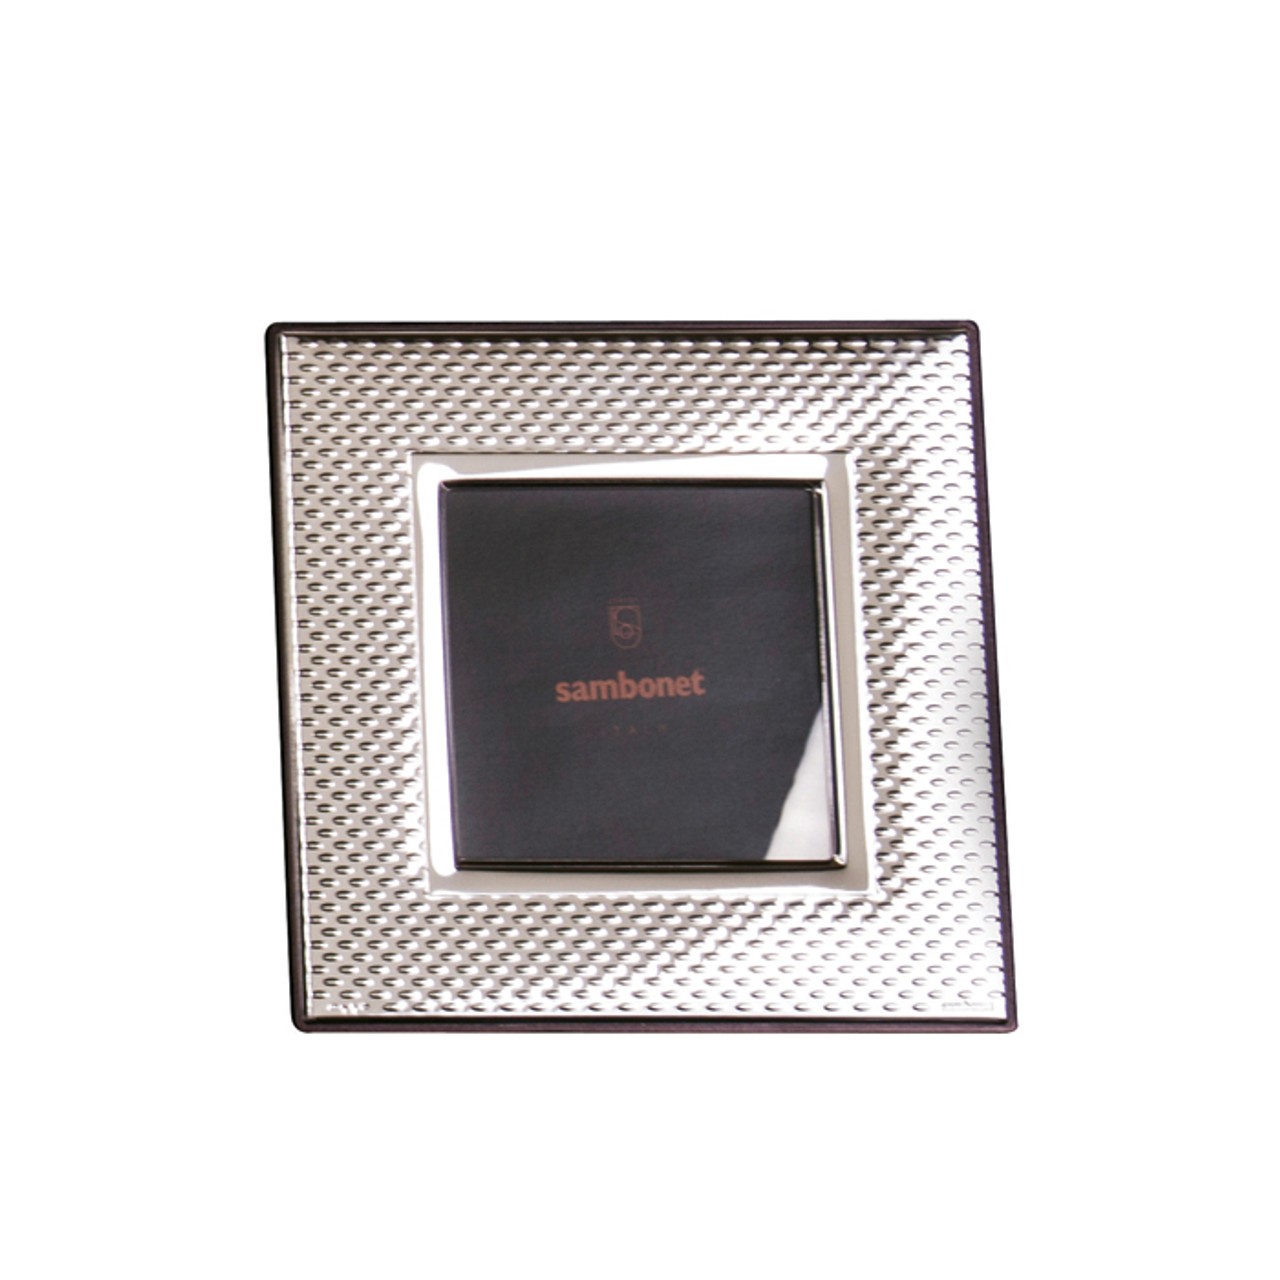 Frames Dew Frame 3 12 X 3 12 Inch Sambonet Online Store